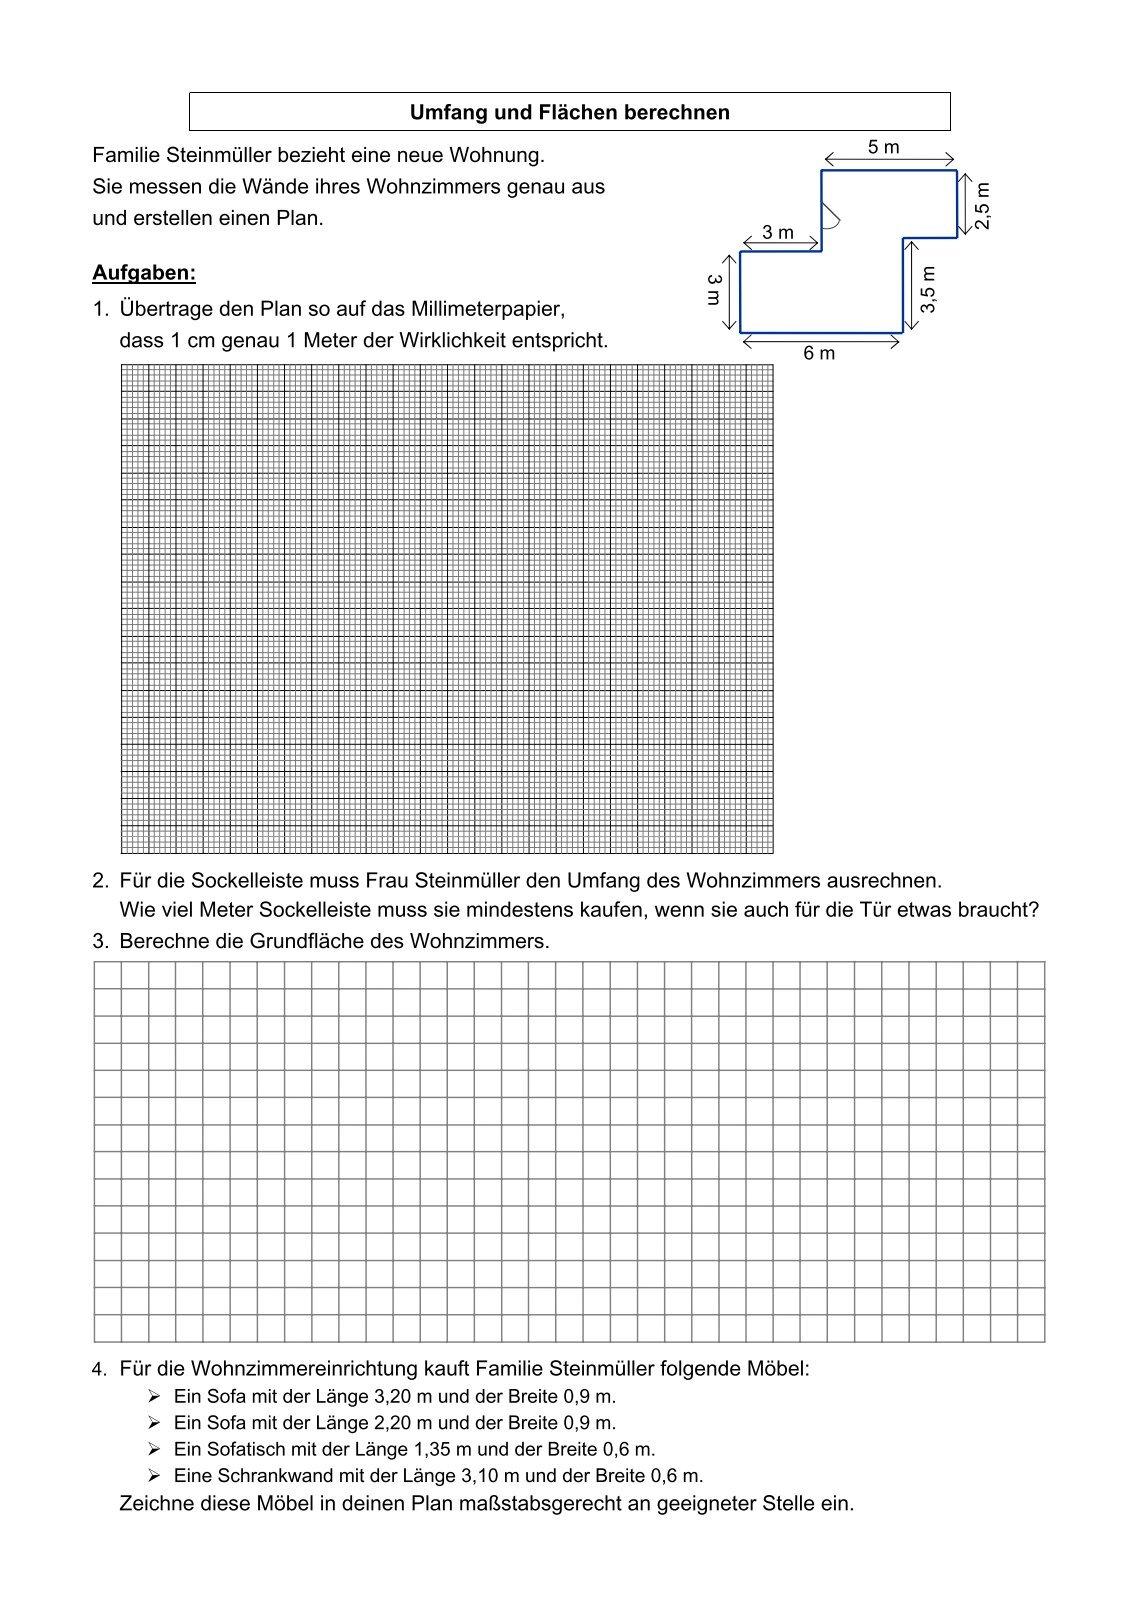 Berühmt Algebra 2 Arbeitsblatt Mit Antworten Galerie - Arbeitsblatt ...